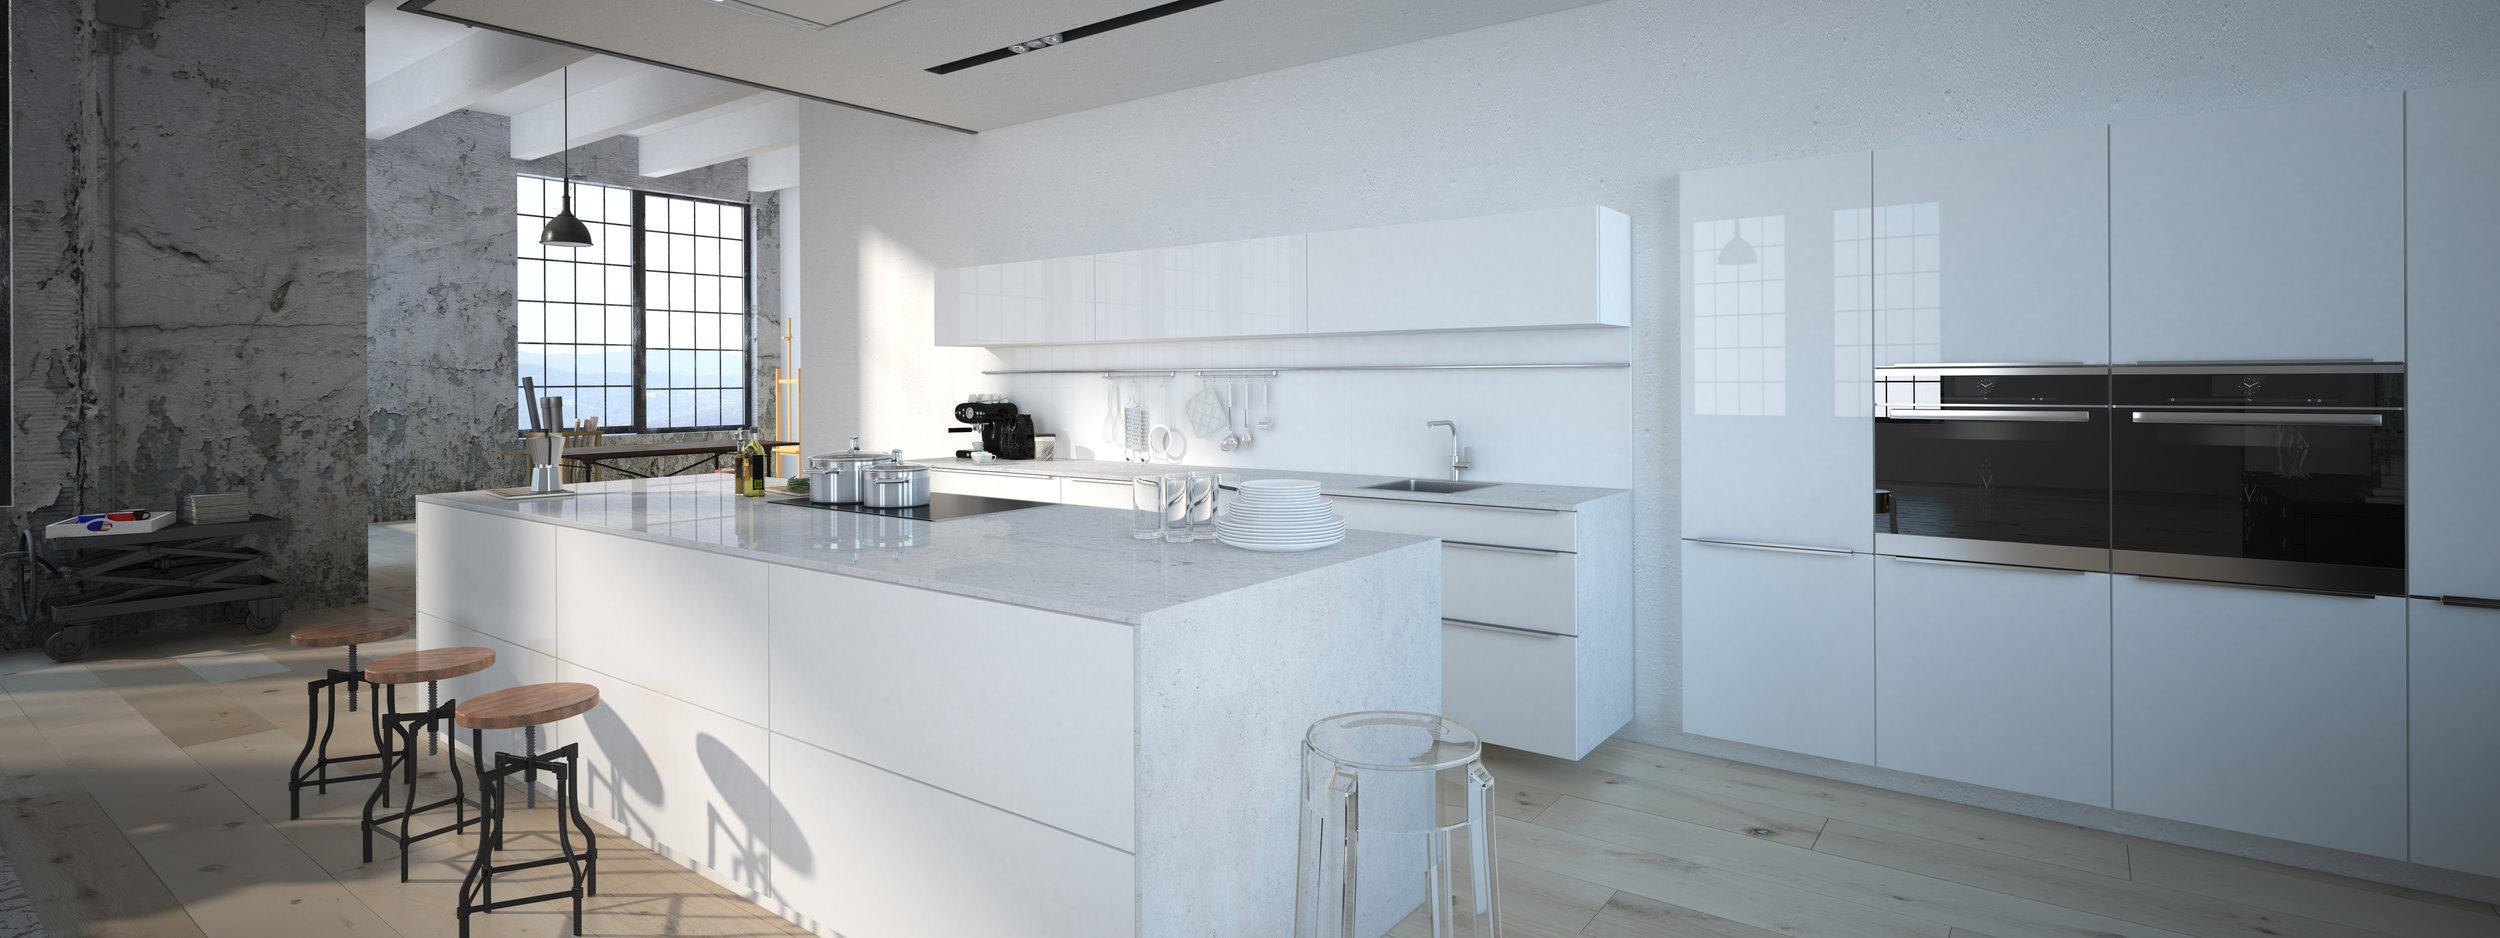 CQ853 Bianco Cristal Countertop